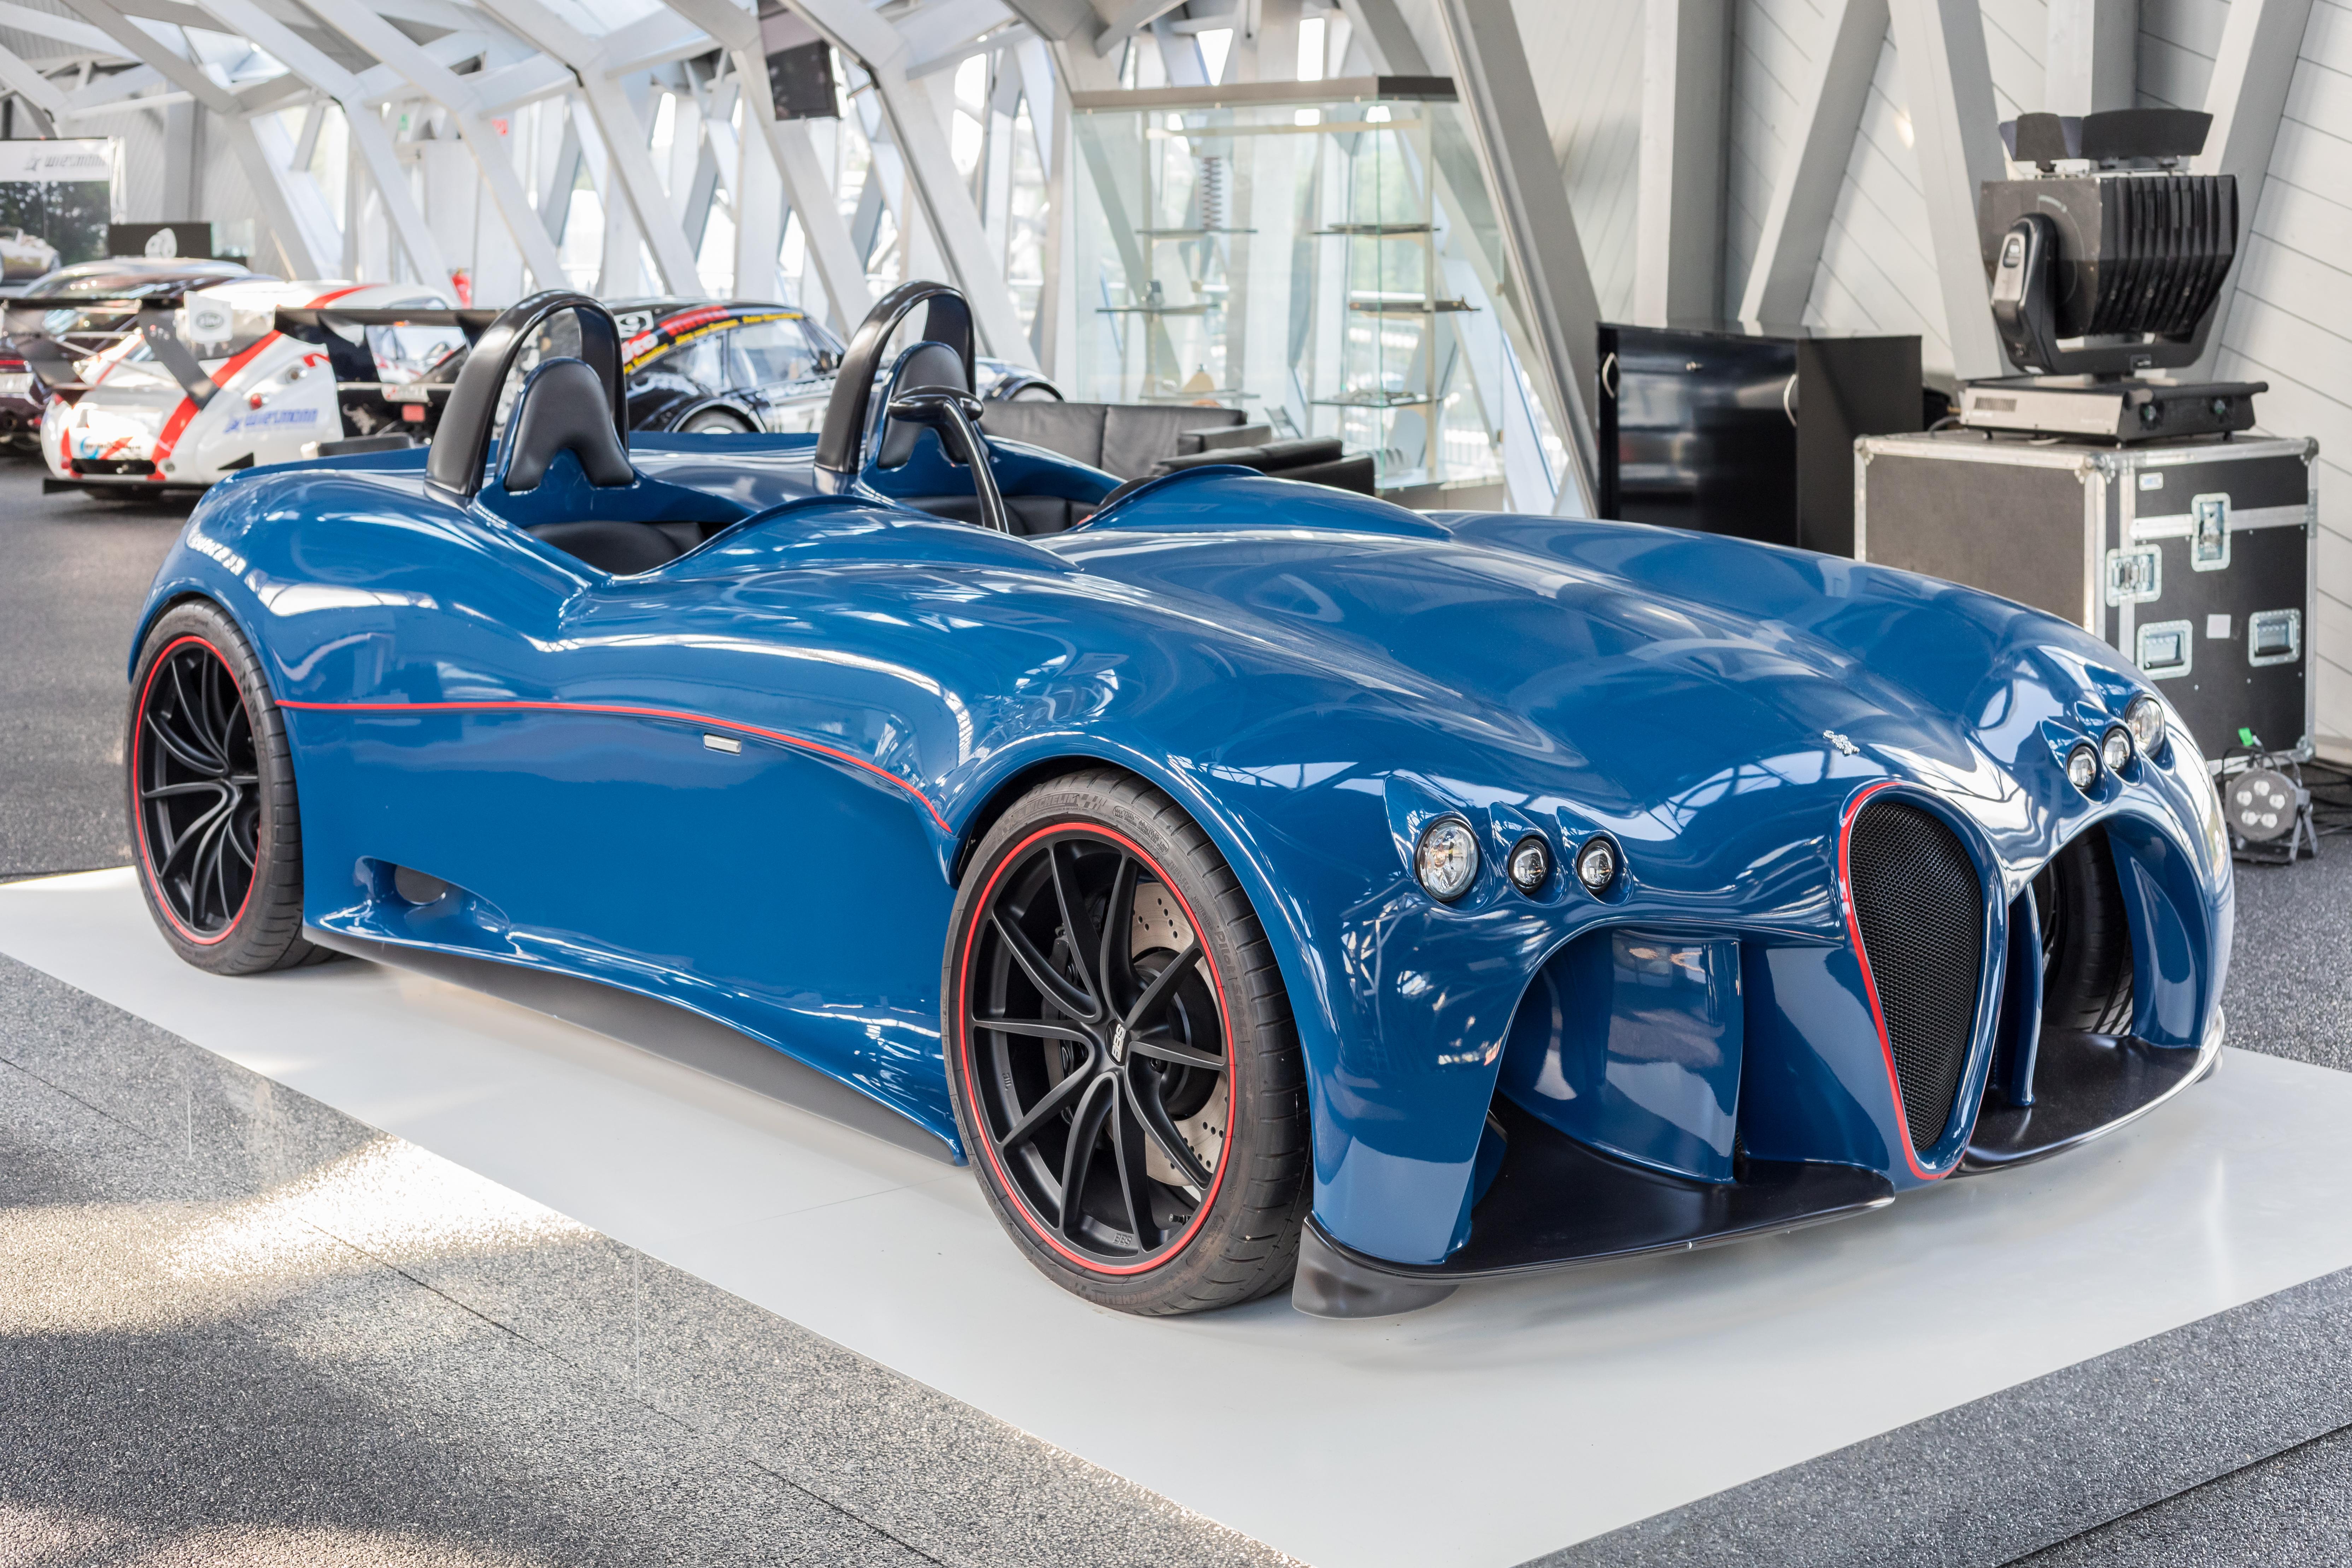 Concept at Wiesmann Sports Cars, Dülmen, North Rhine-Westphalia, Germany (2018) German Wiesmann Spyder Concept bei Wiesmann Sports Cars, Dülmen, Nordrhein-Westfalen